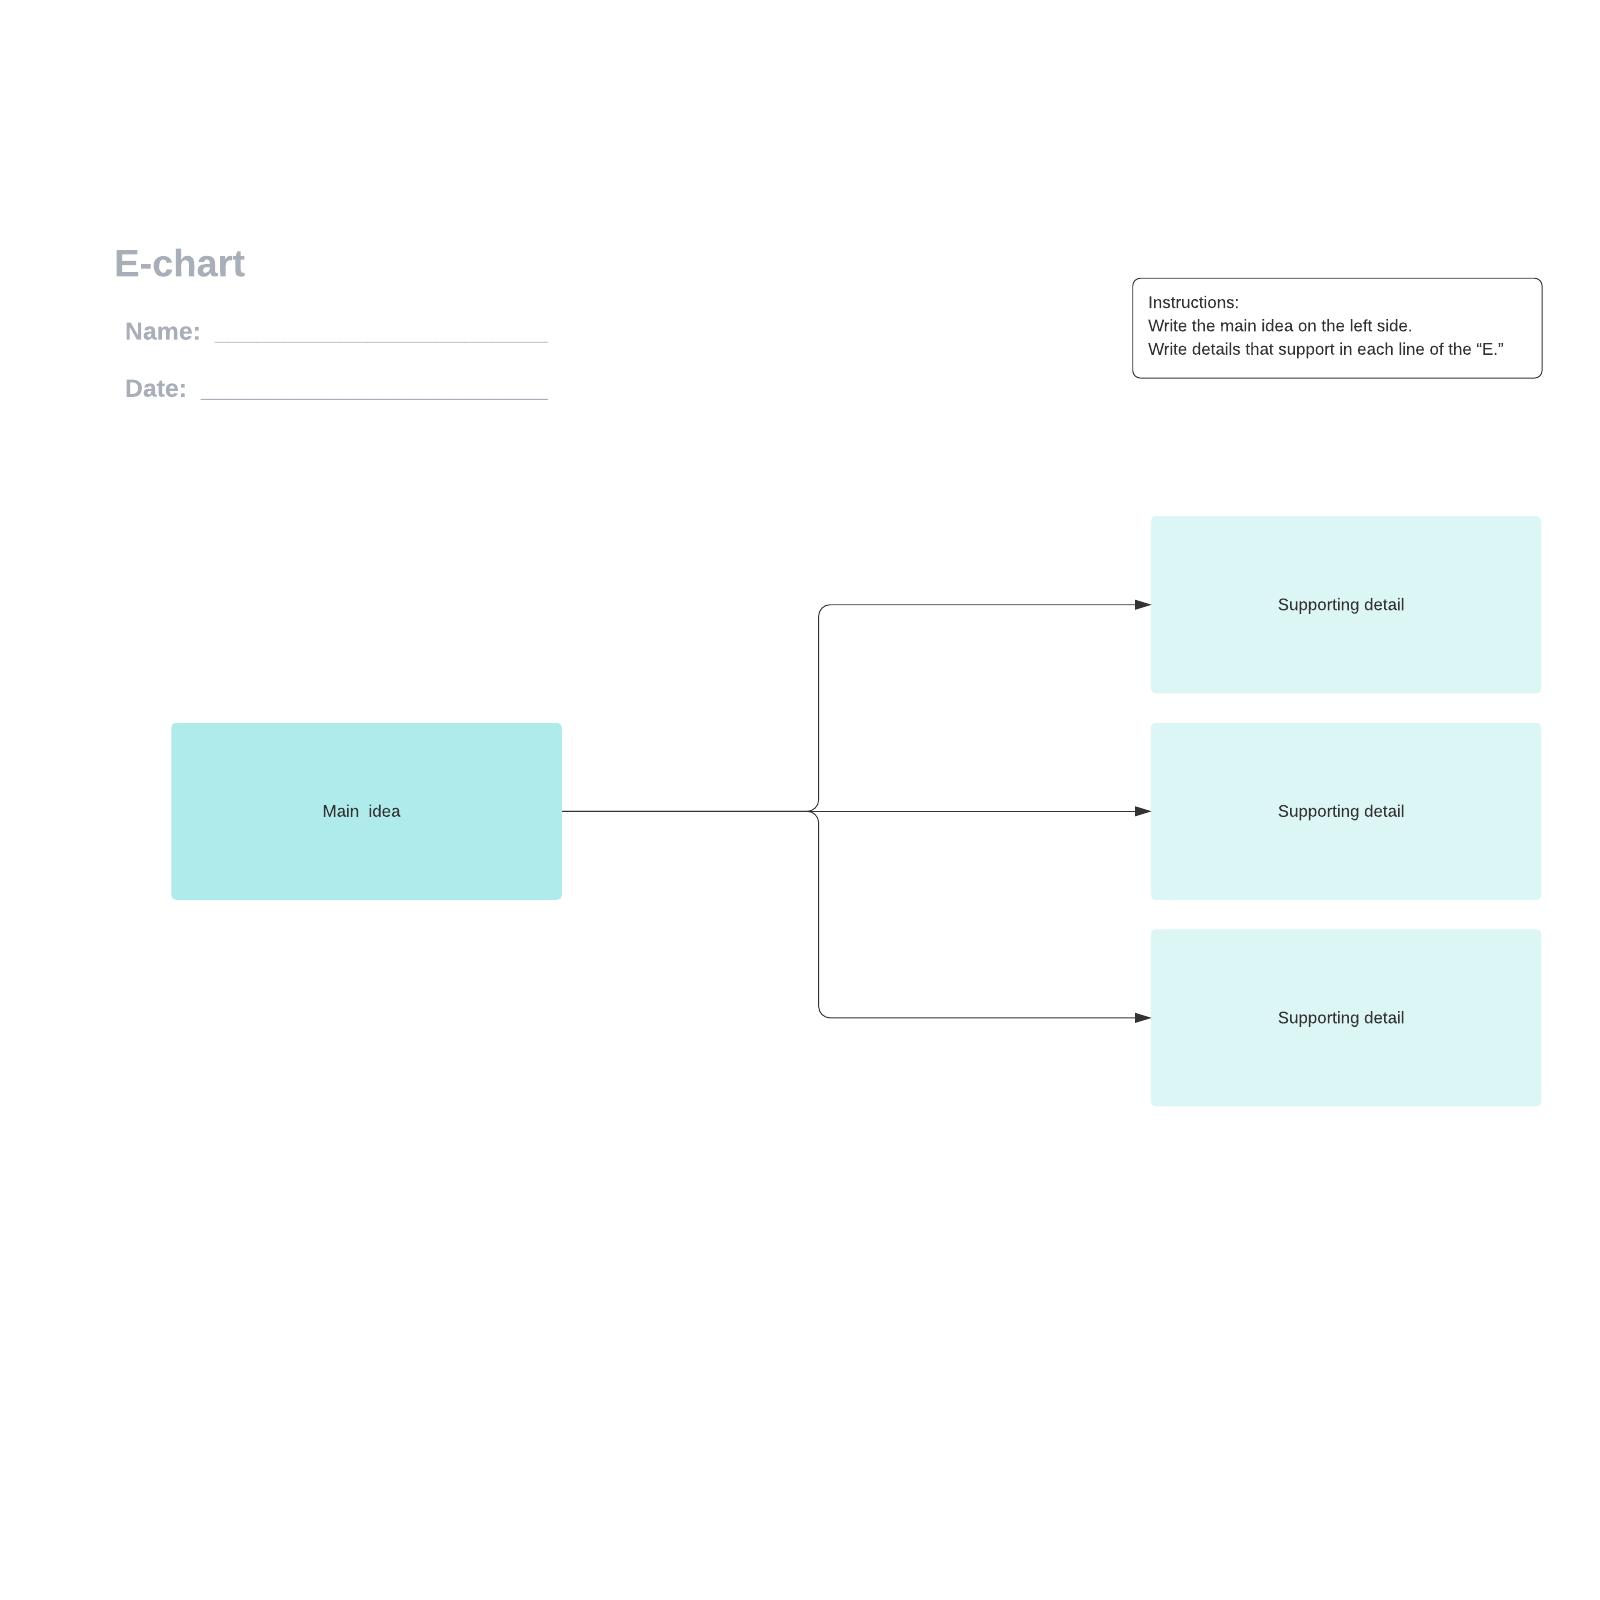 E-chart